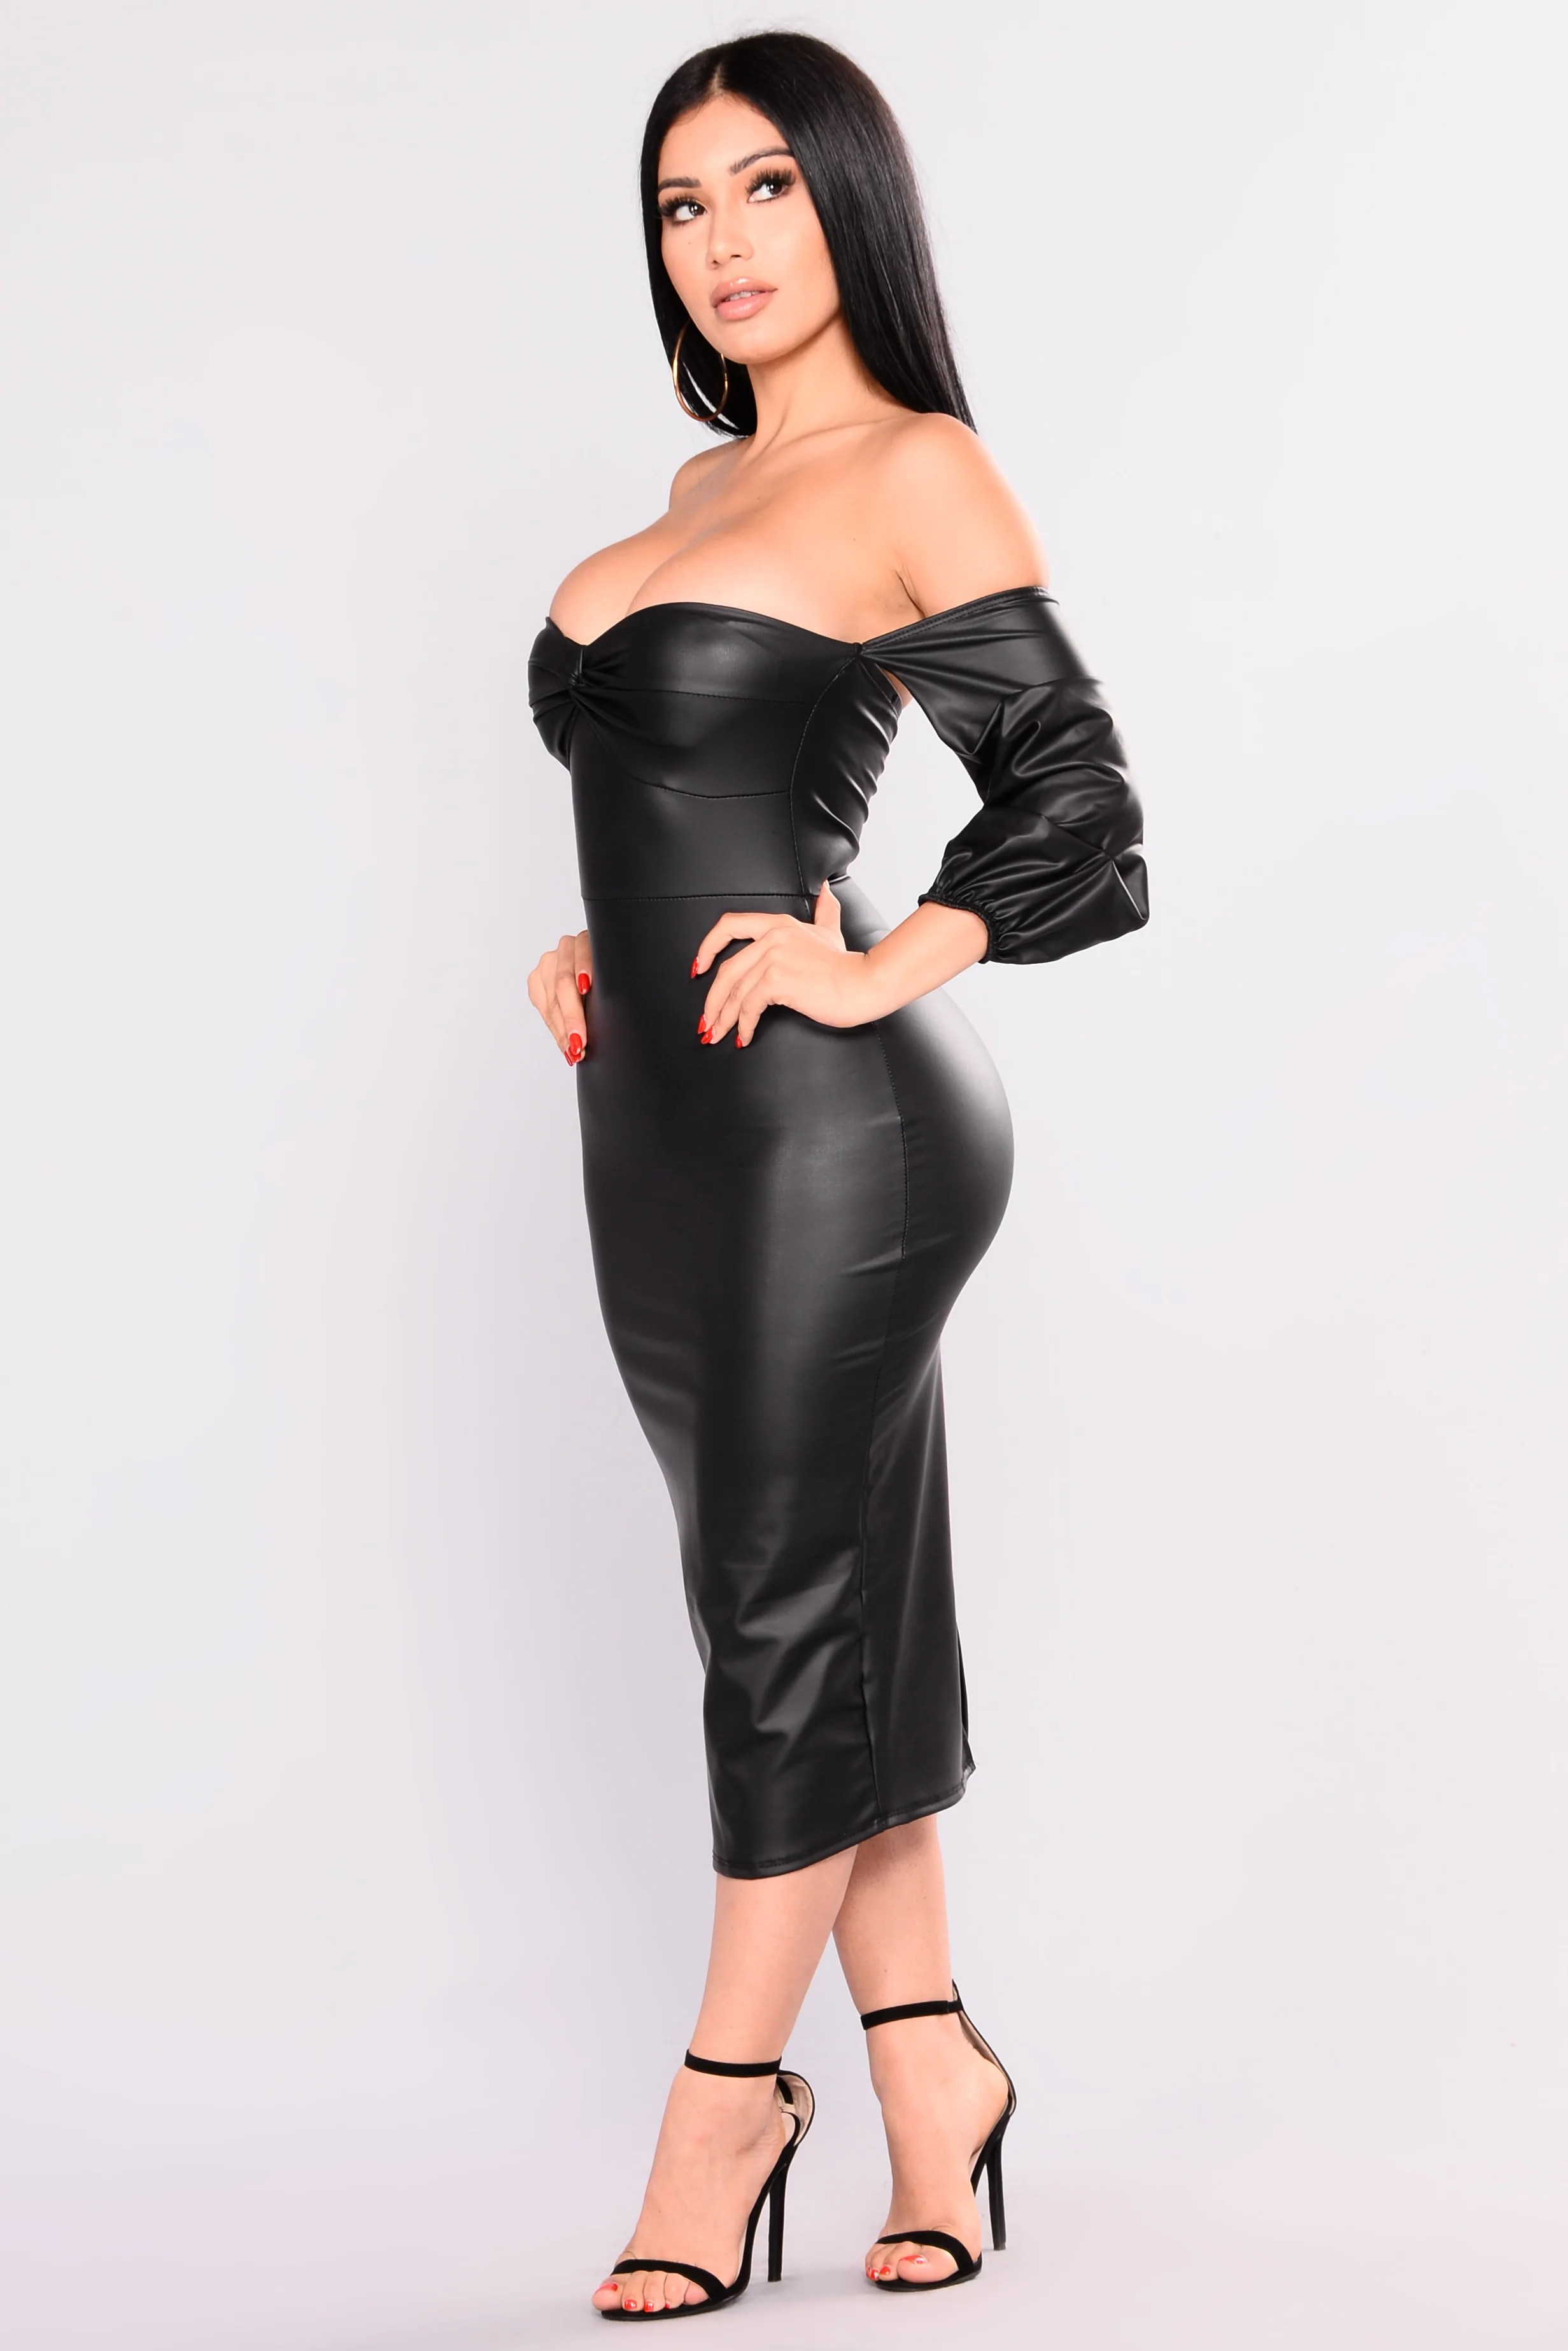 Wild Rider Leather Dress - Black